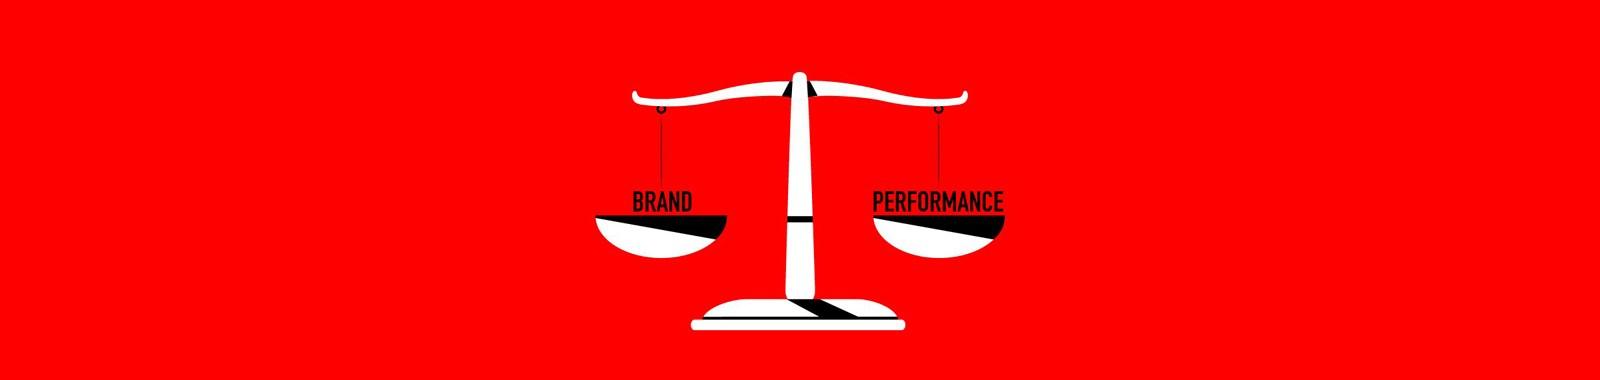 brandperformance_scale2-eye